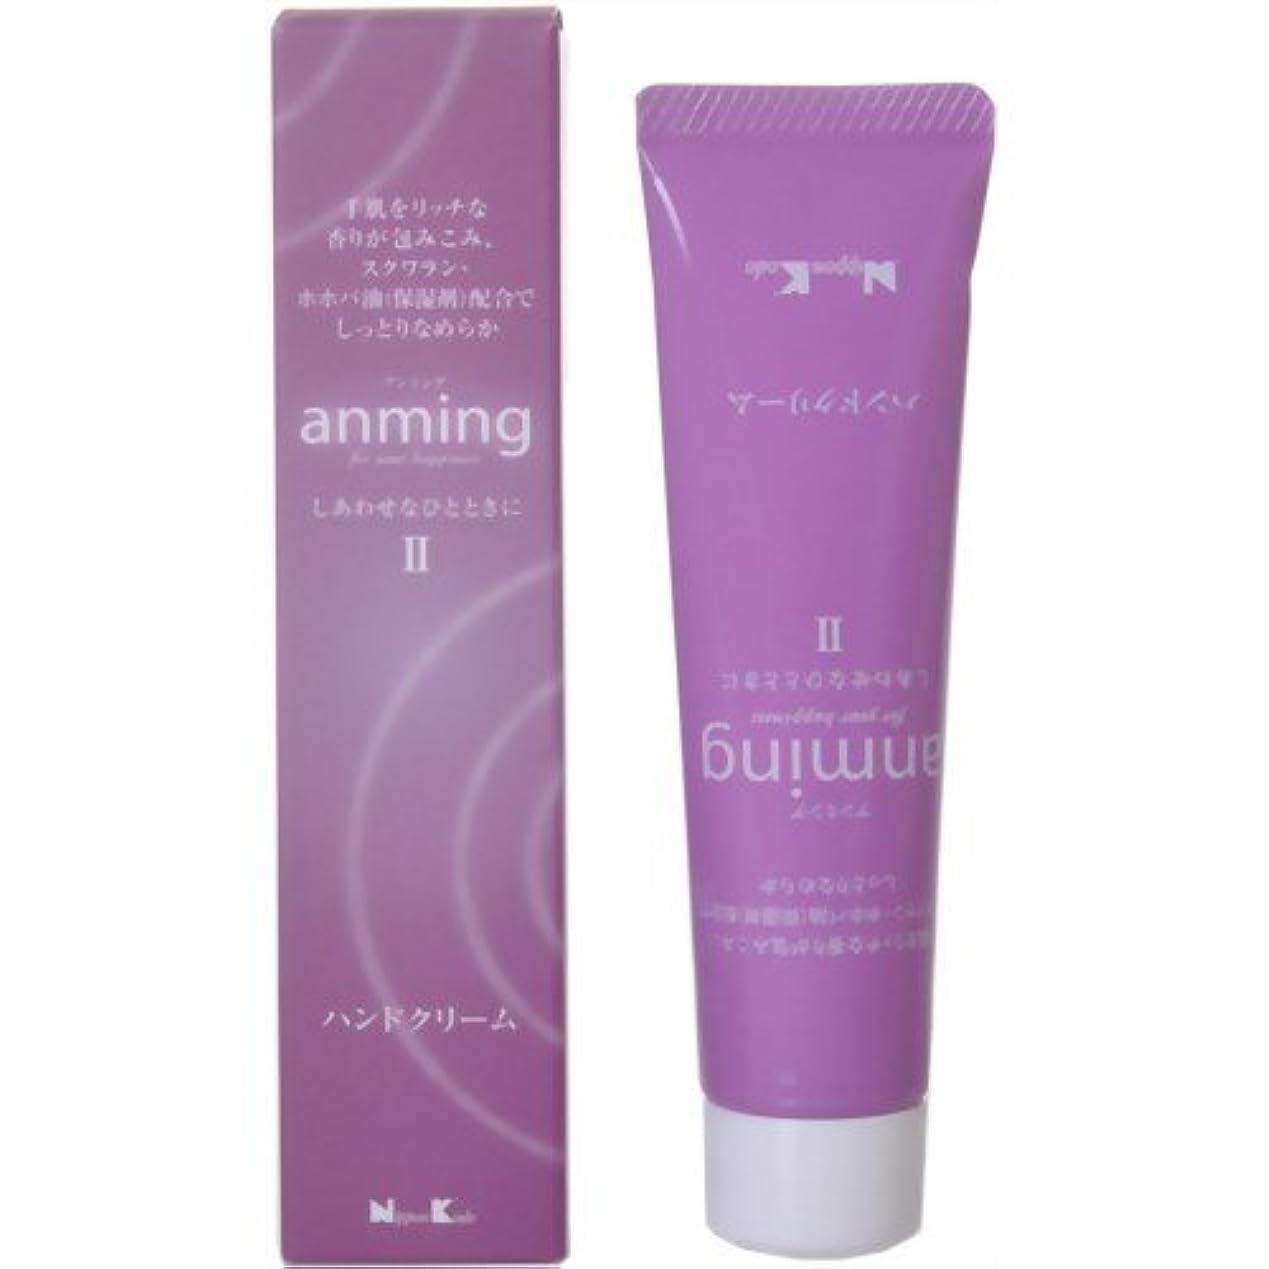 anming2(アンミング2) ハンドクリーム32g入